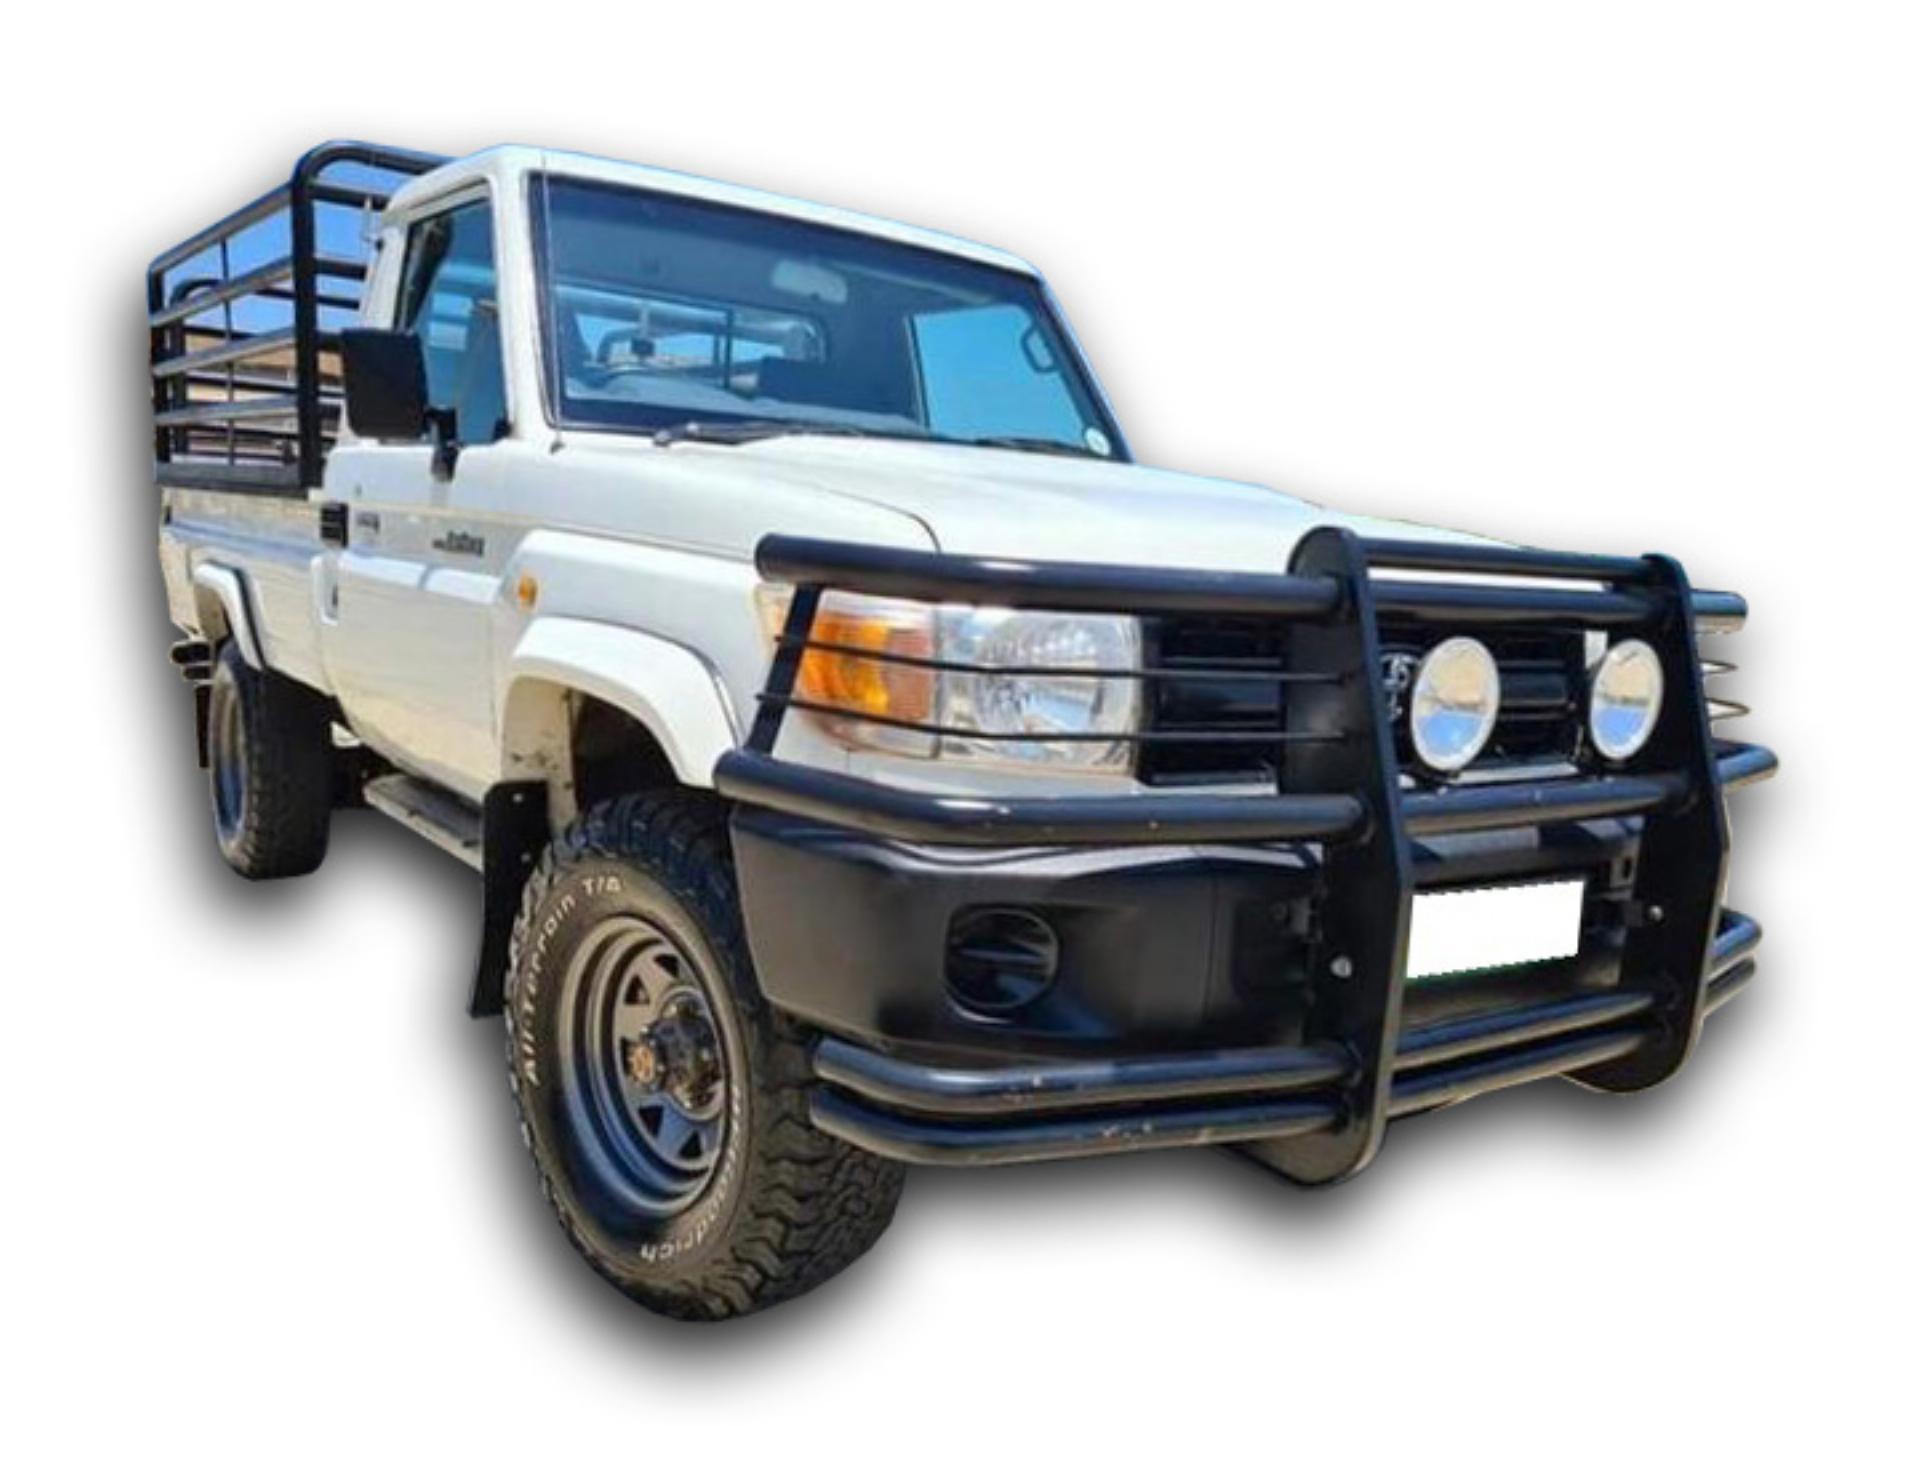 Toyota Land Cruiser 79 4.0 Petrol